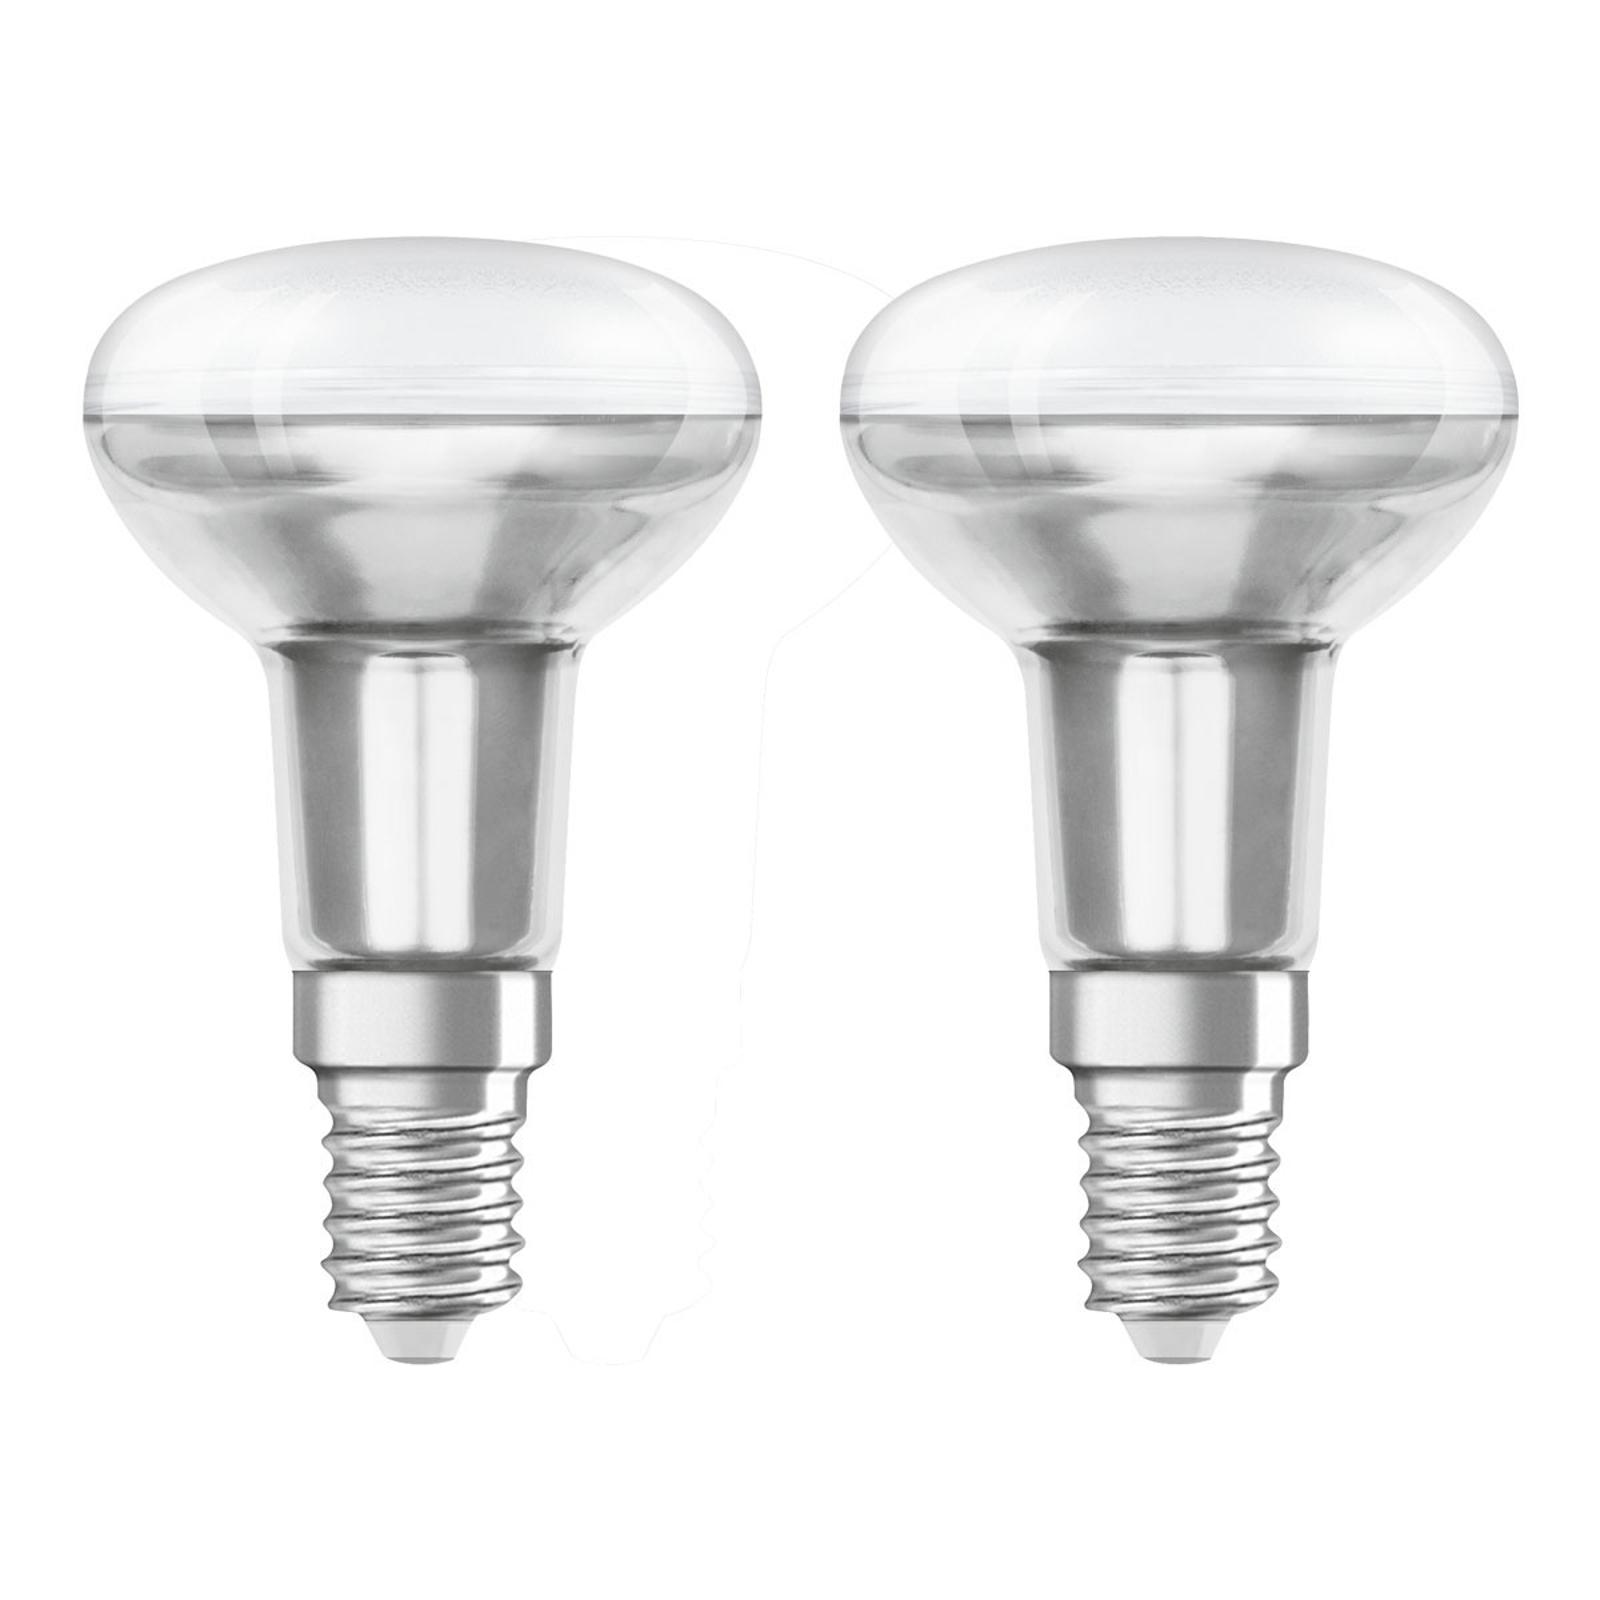 OSRAM reflektor LED E14 3,3W 2700K 36° 2 szt.